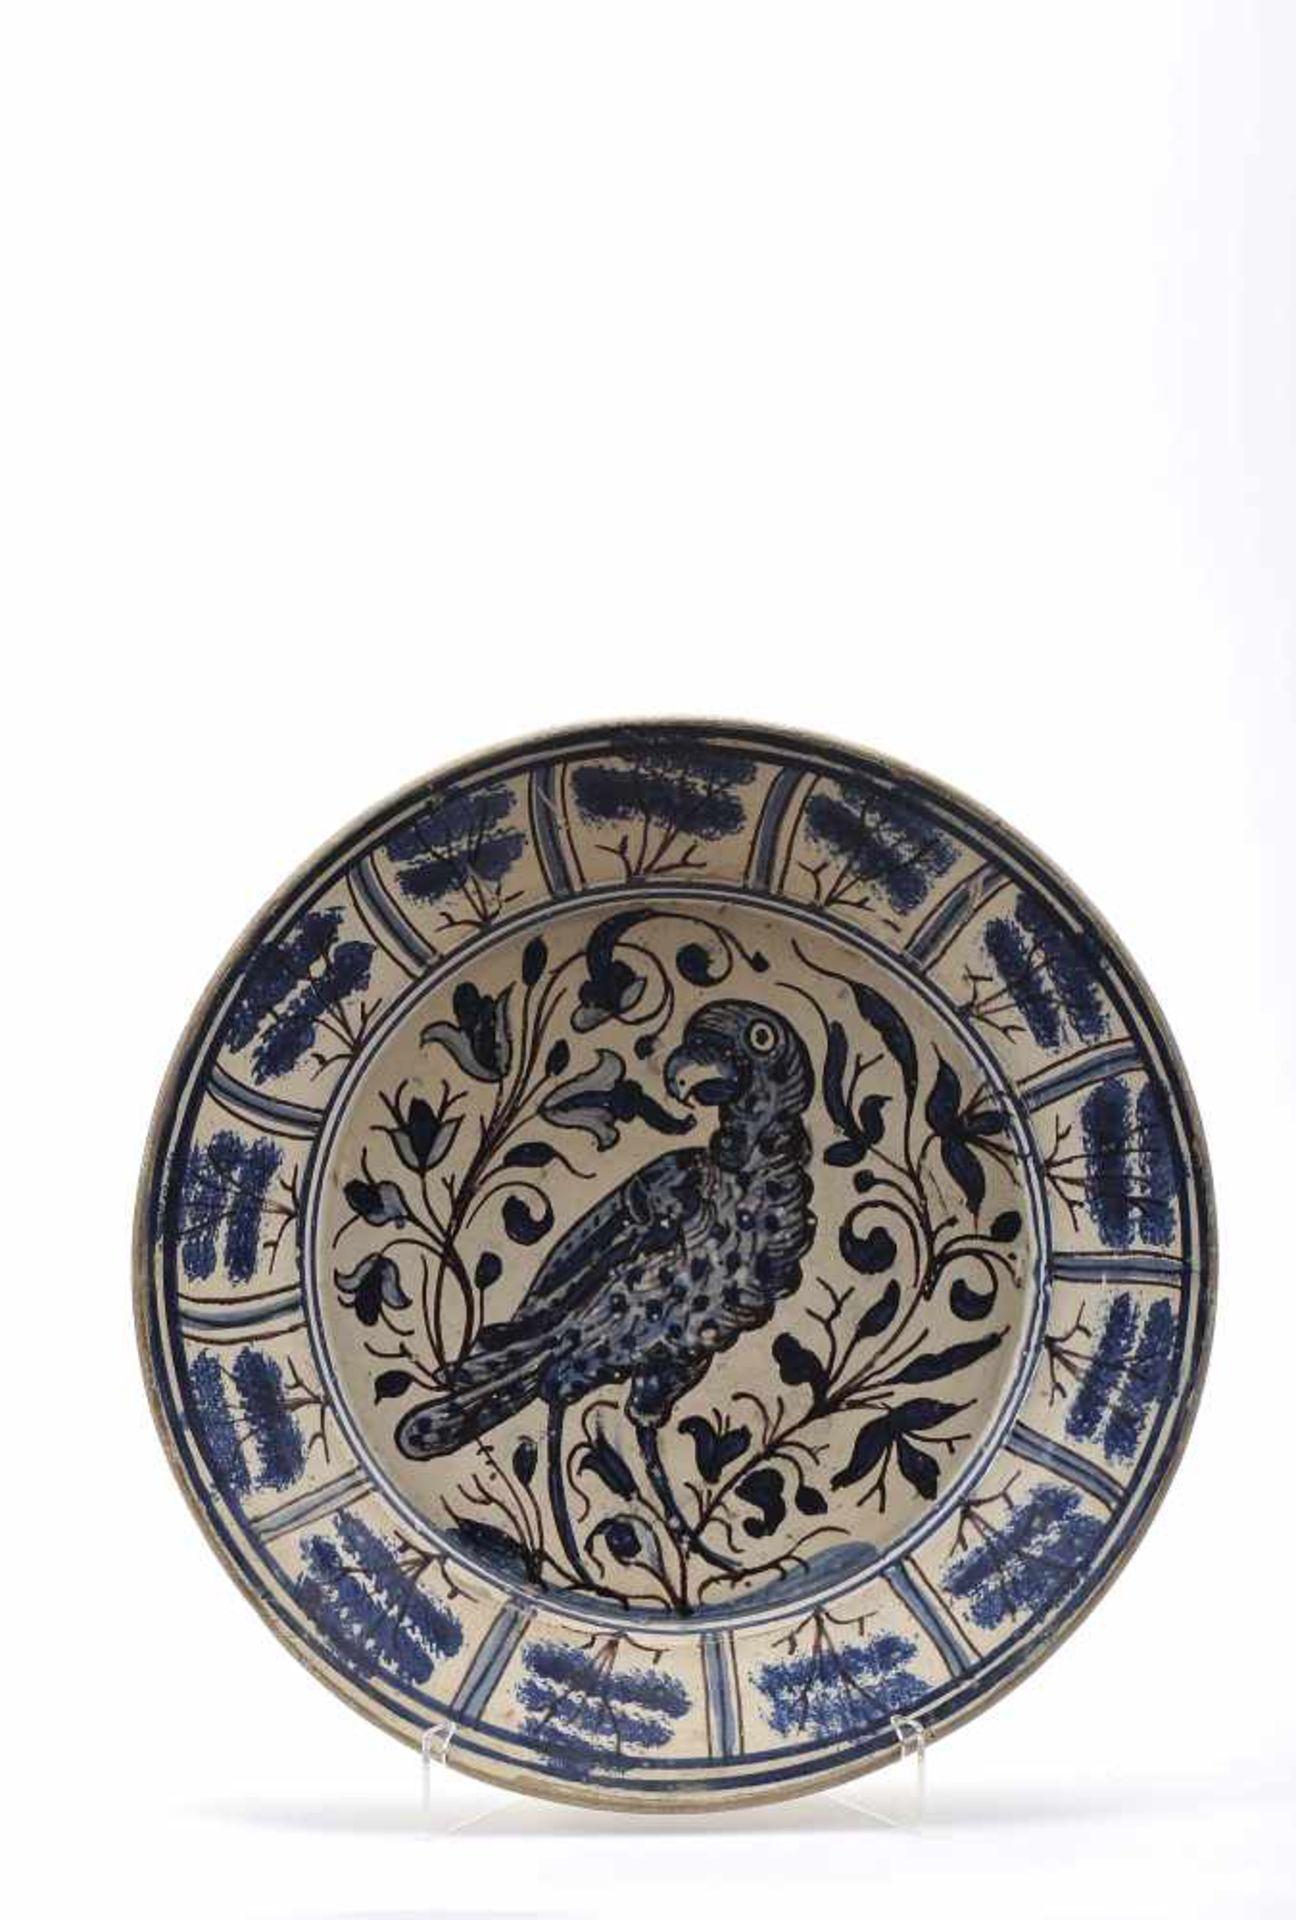 "Los 49 - A DishA Dish, Coimbra's faience, blue and vinous decoration aka 'Brioso', ""Parrot"", Portuguese,..."